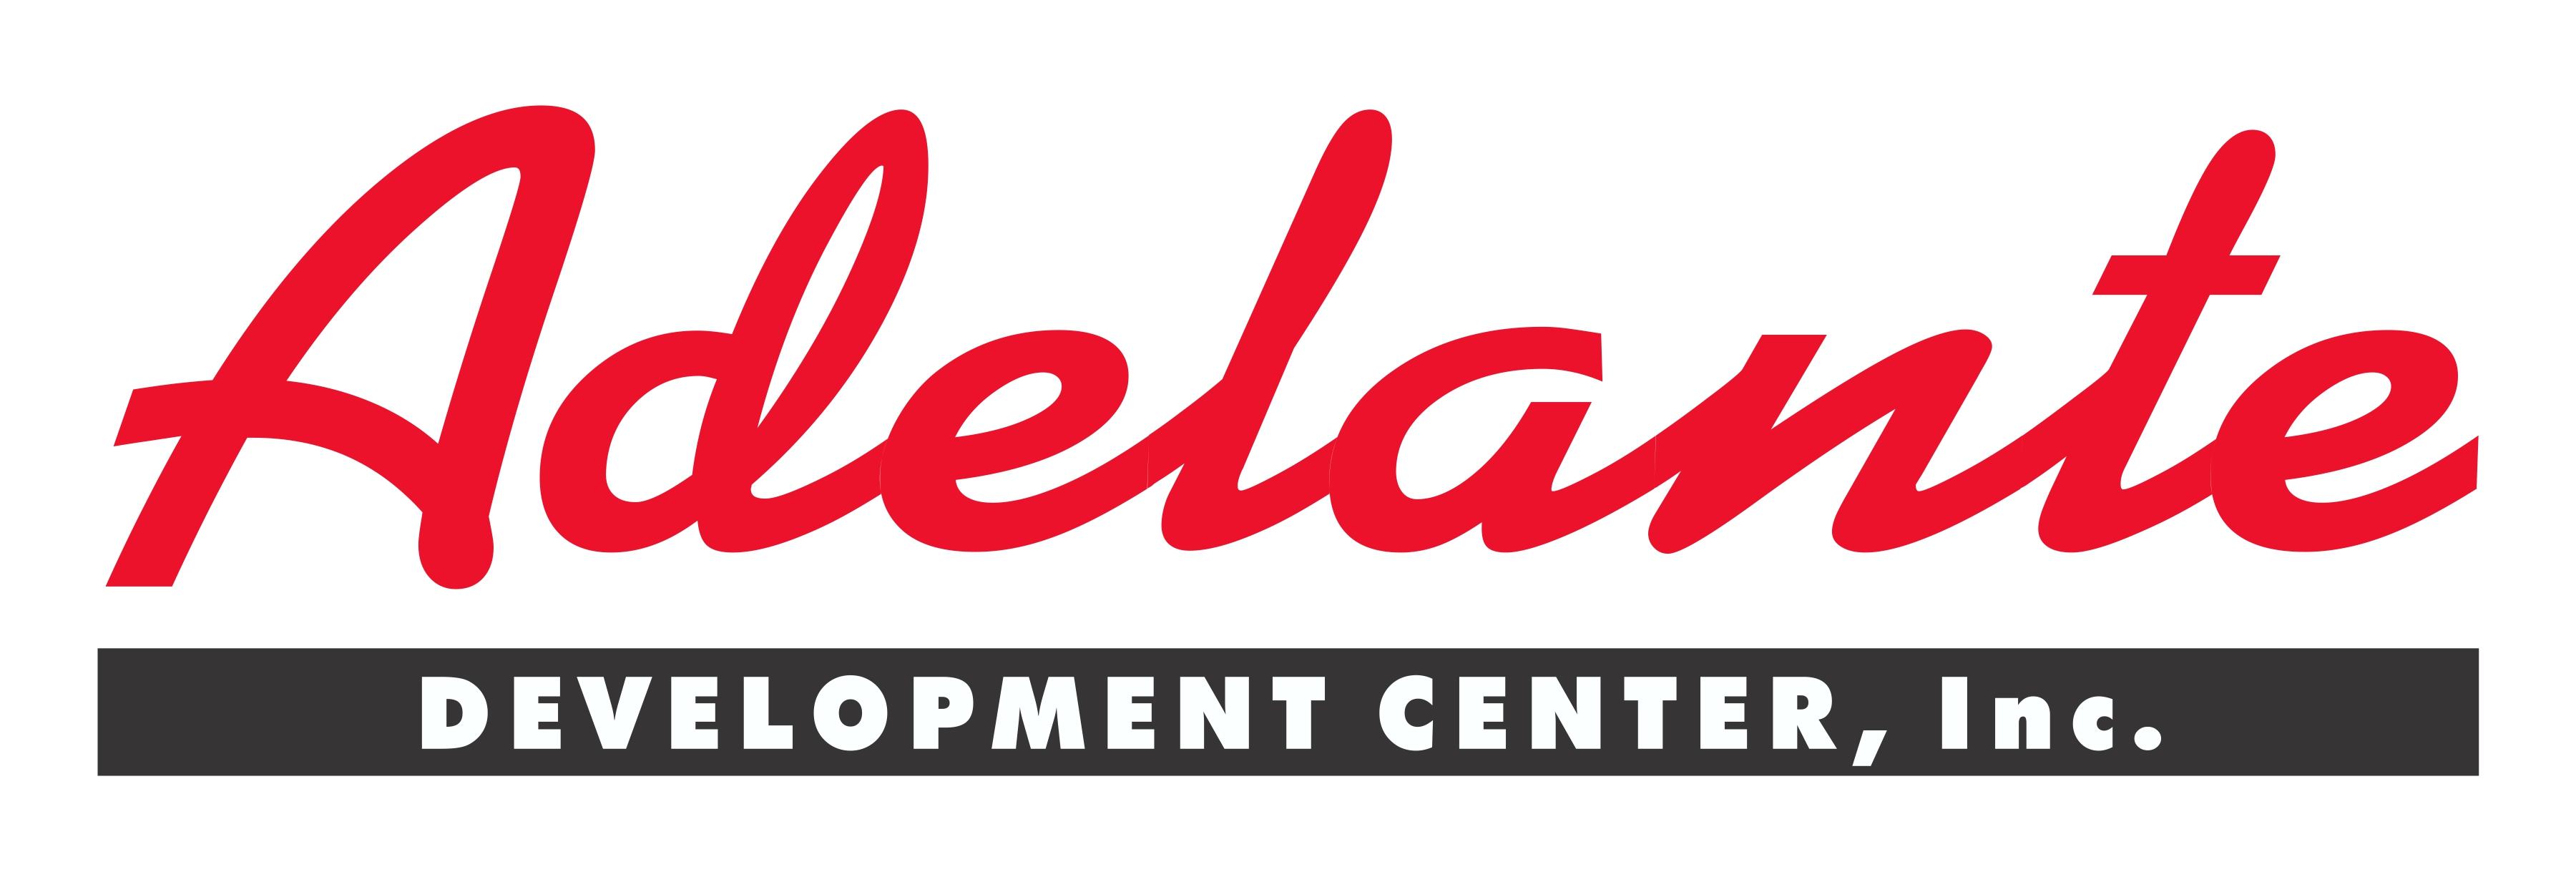 Adelante Development Center, Inc.